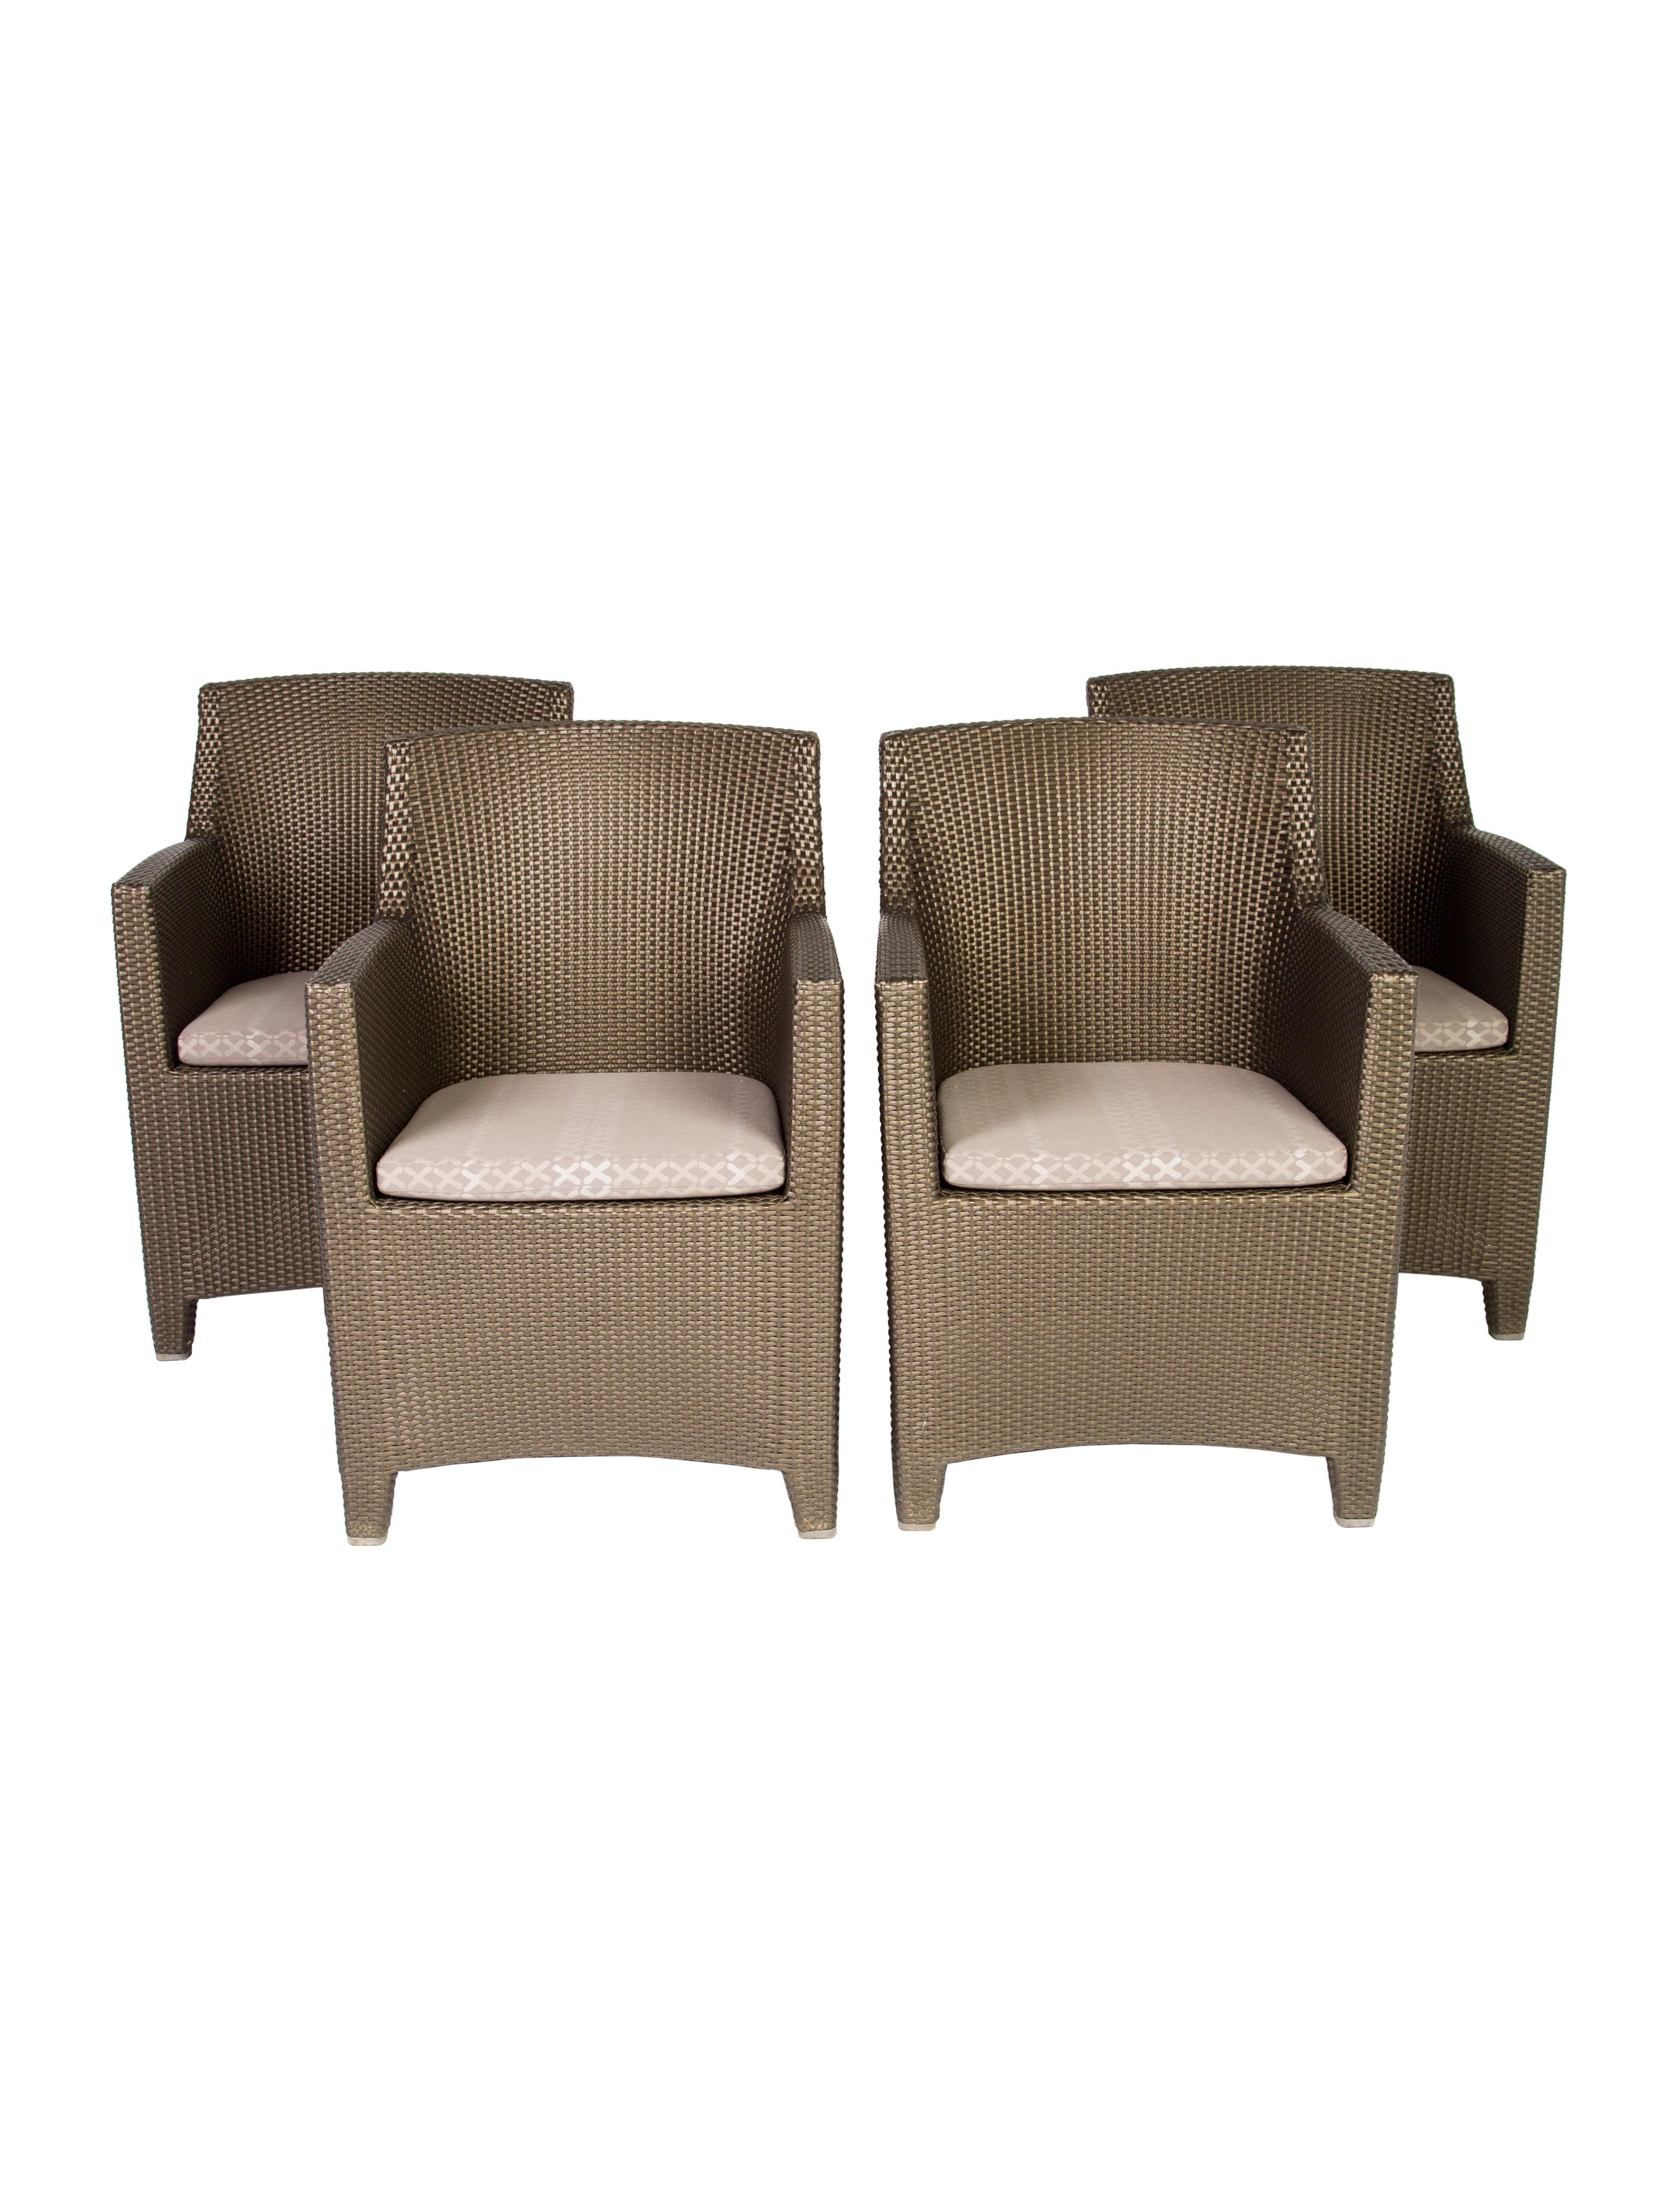 Dedon Barcelona Dining Chairs